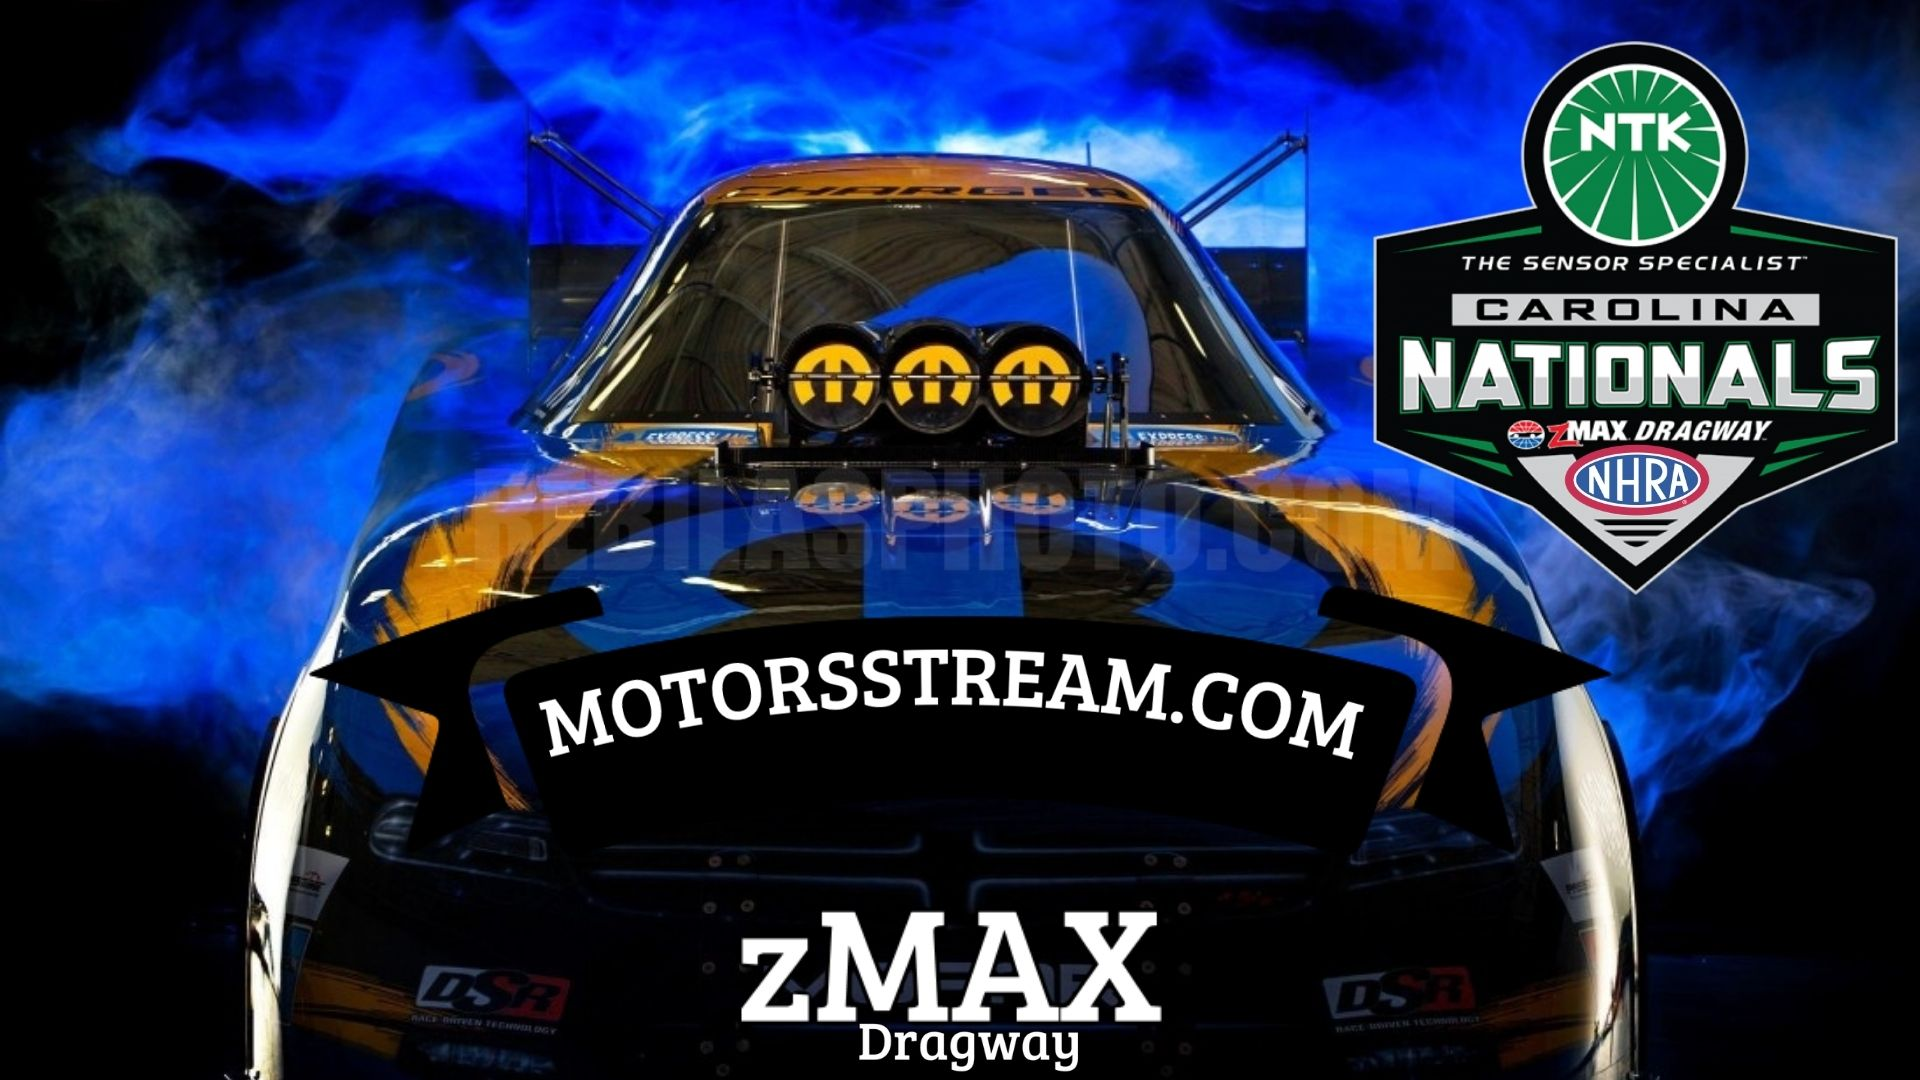 NTK NHRA Carolina Nationals 2021 Live Stream